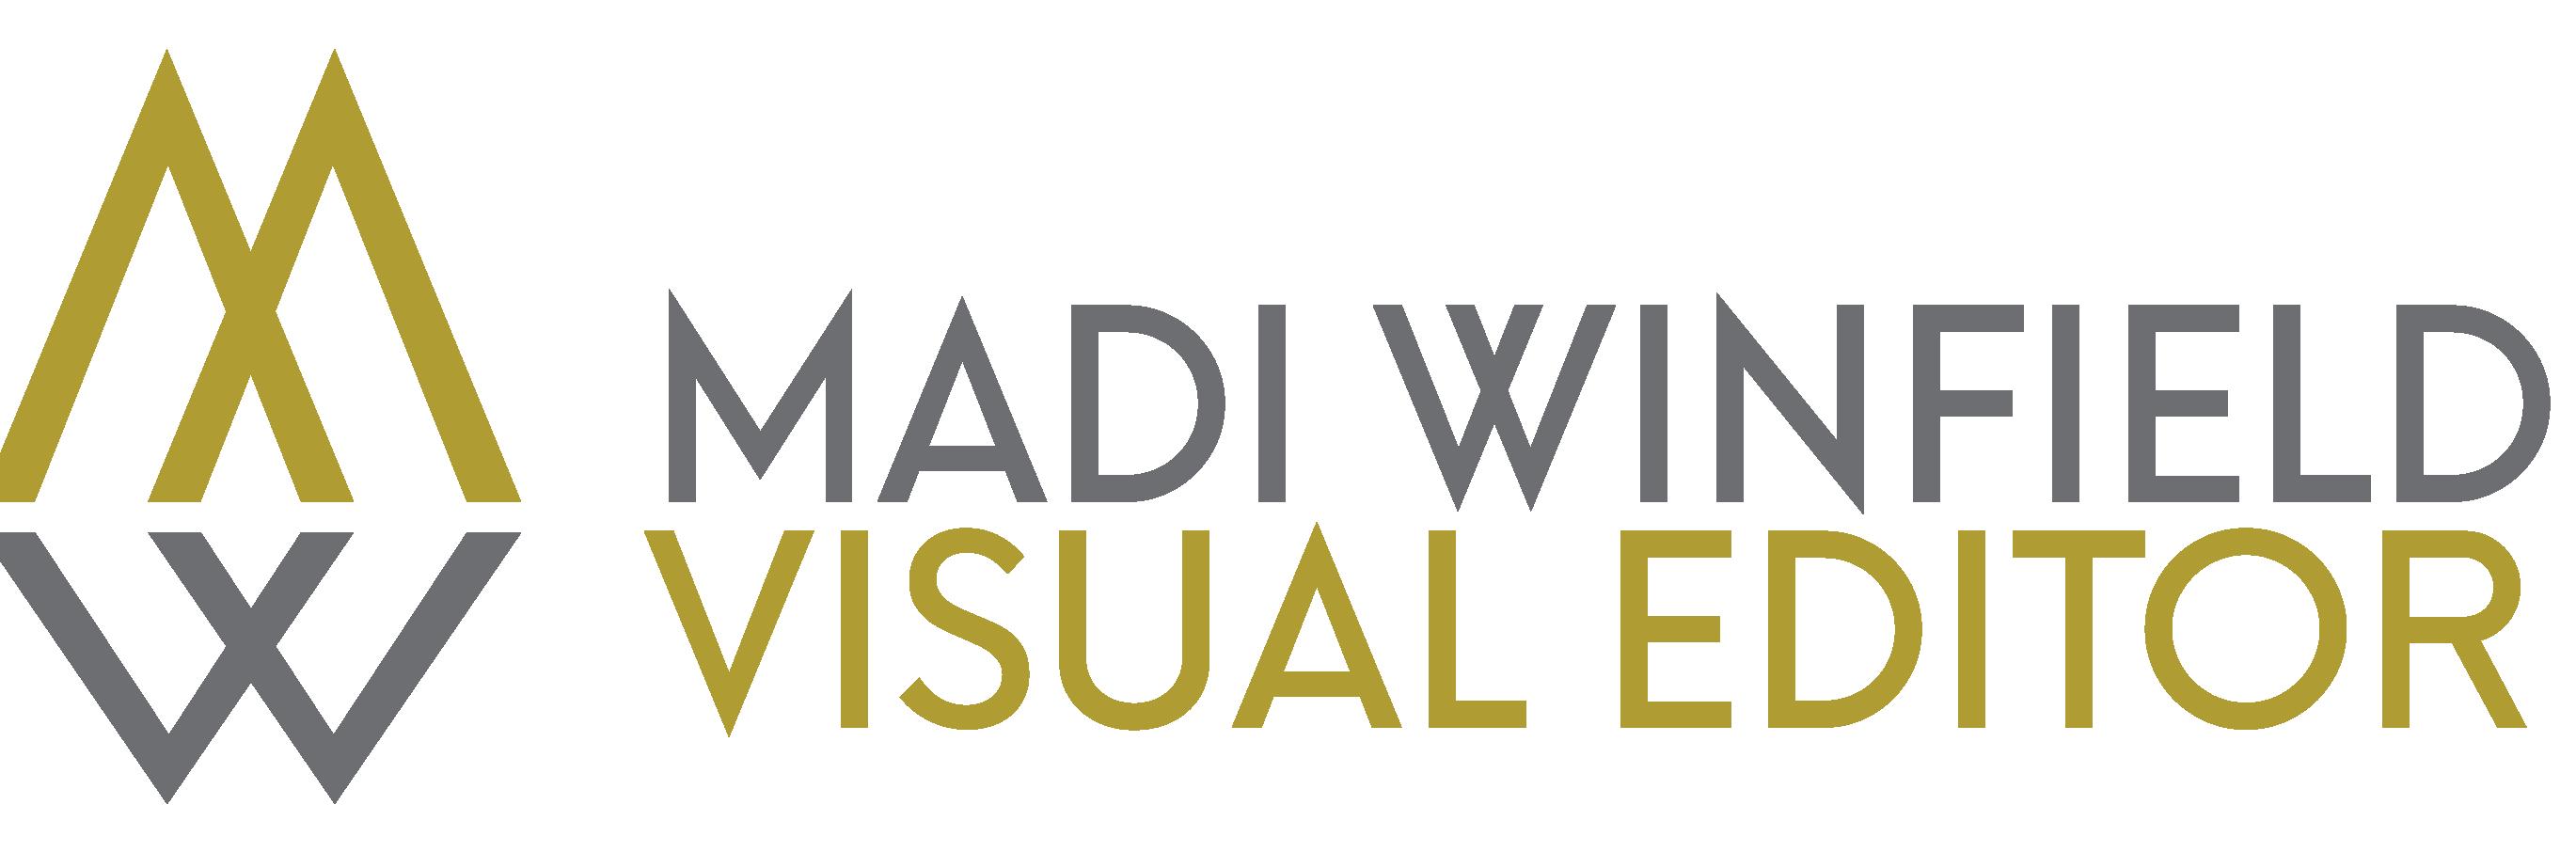 Madi Winfield | Visual Editor